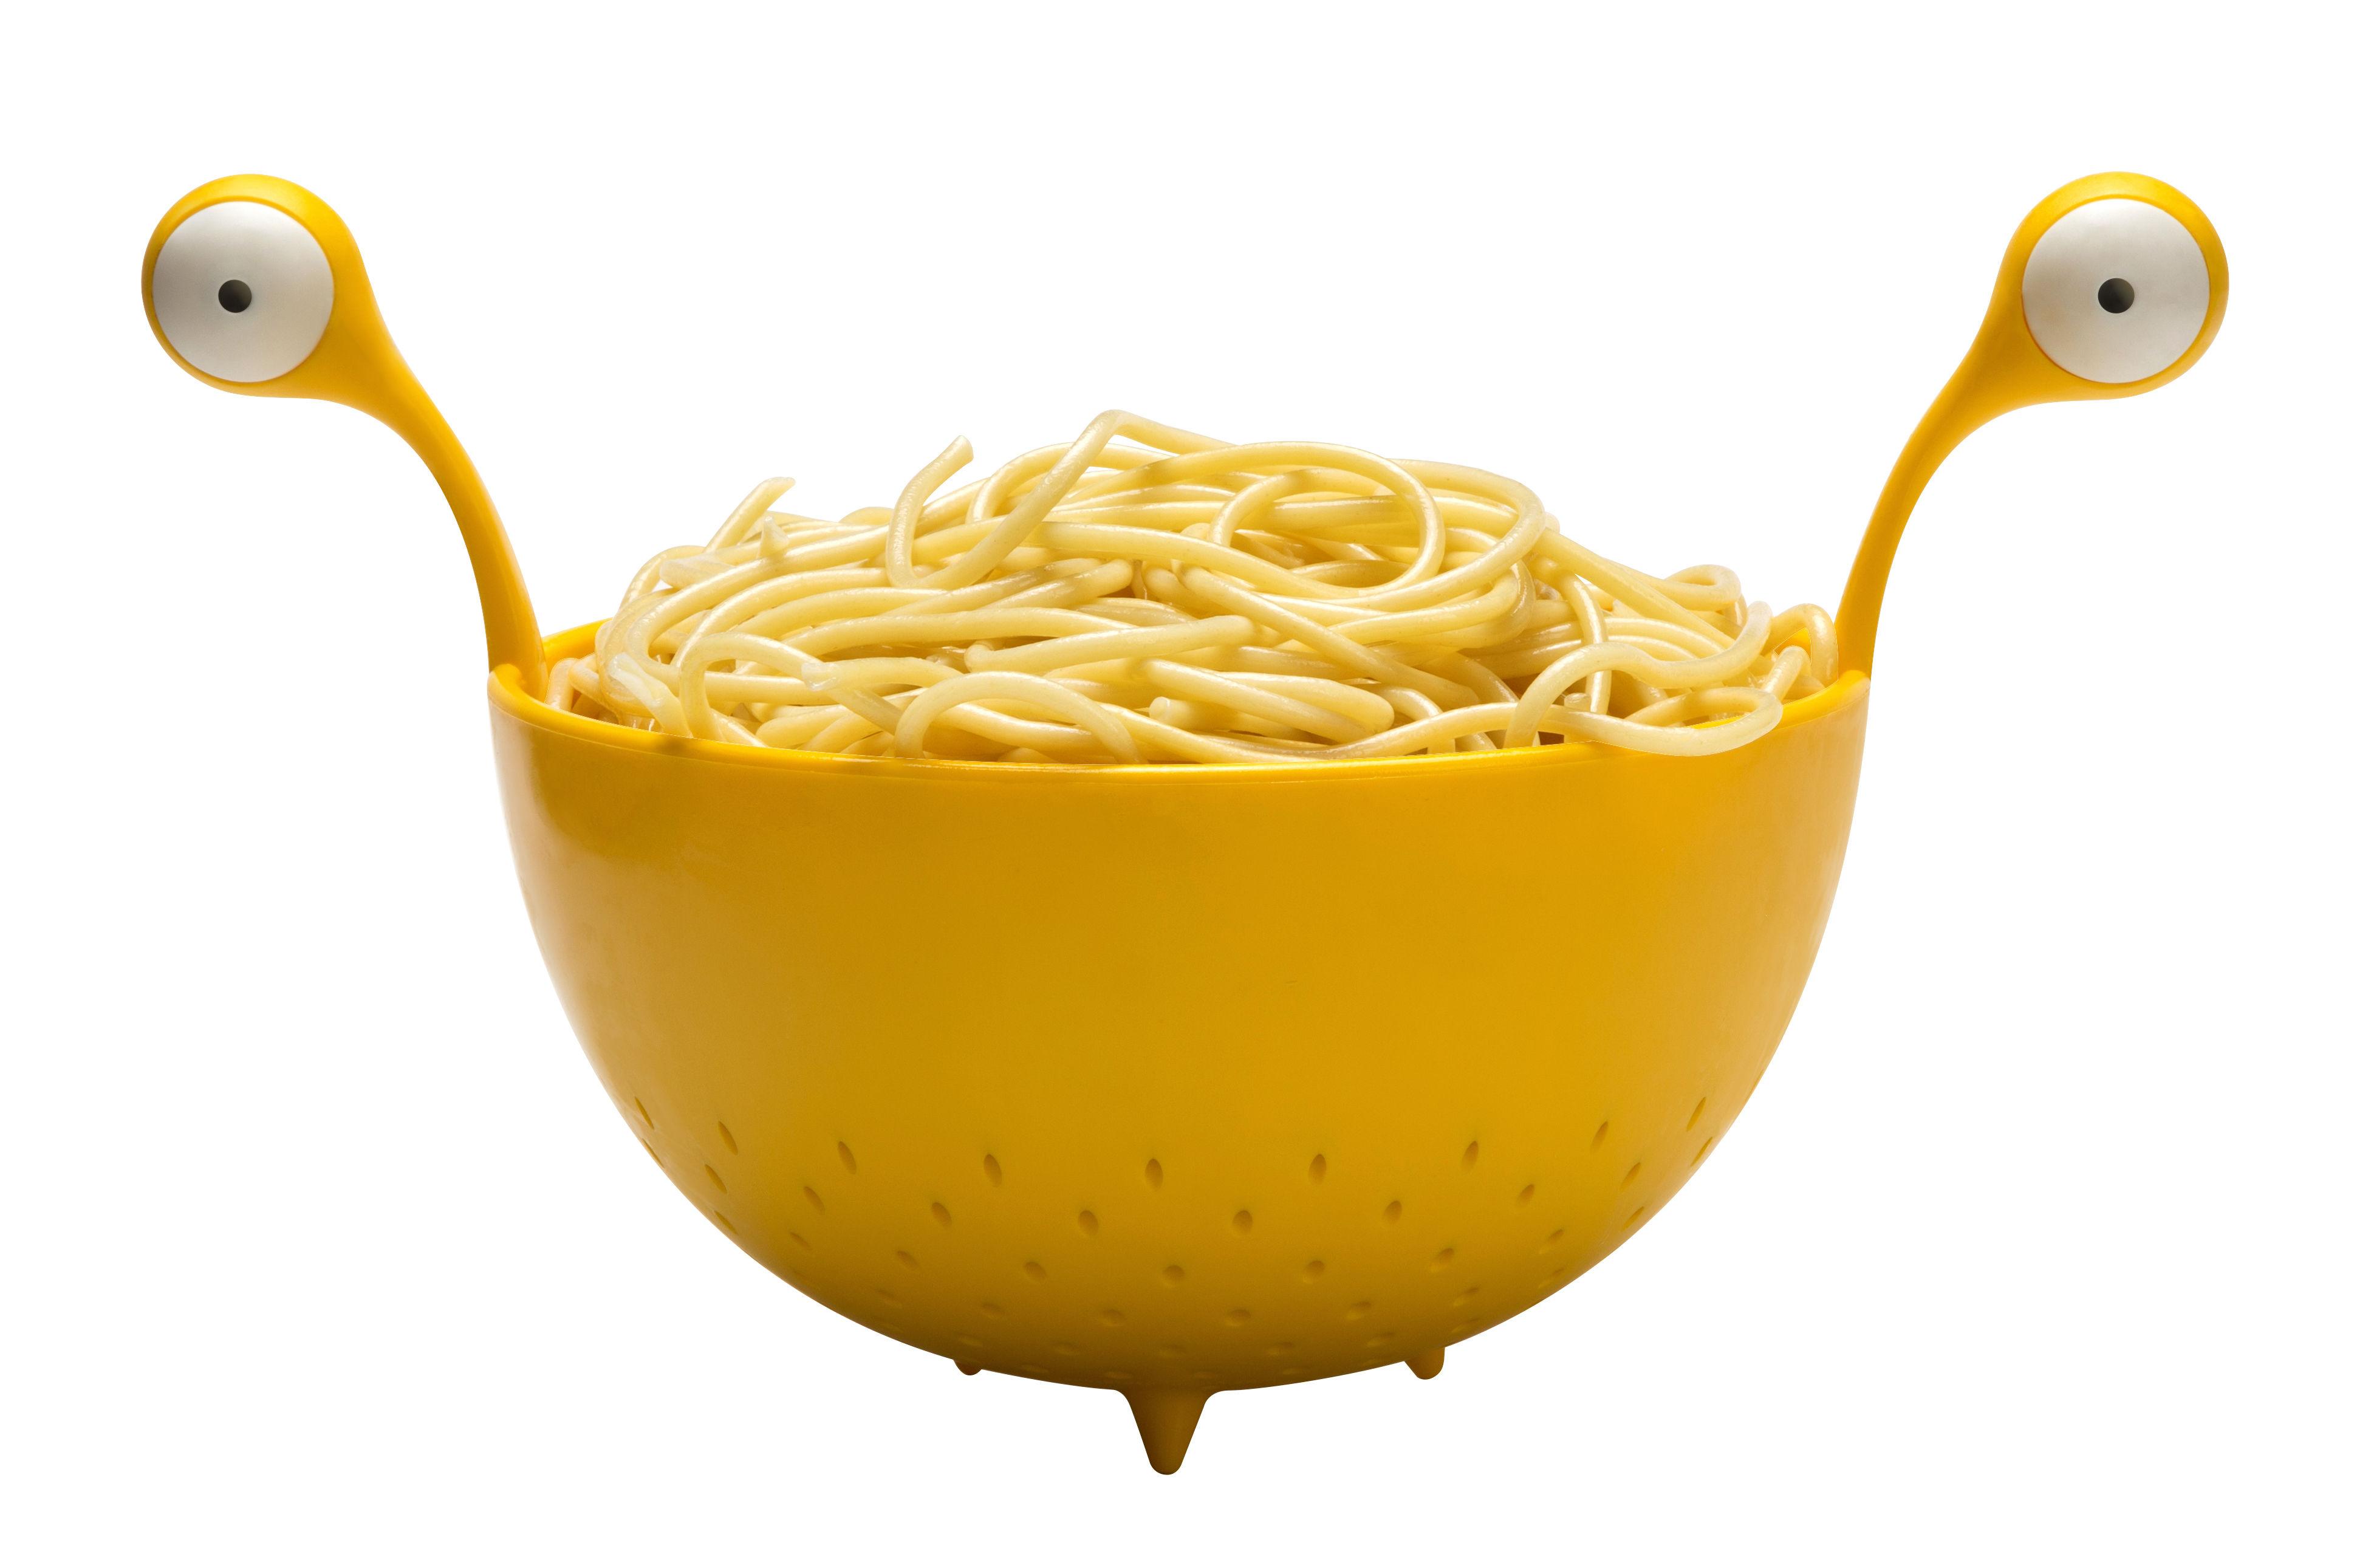 Cucina - Utensili da cucina - Scolapasta Spaghetti Monster - / Ø 22 cm di Pa Design - Giallo - Polipropilene